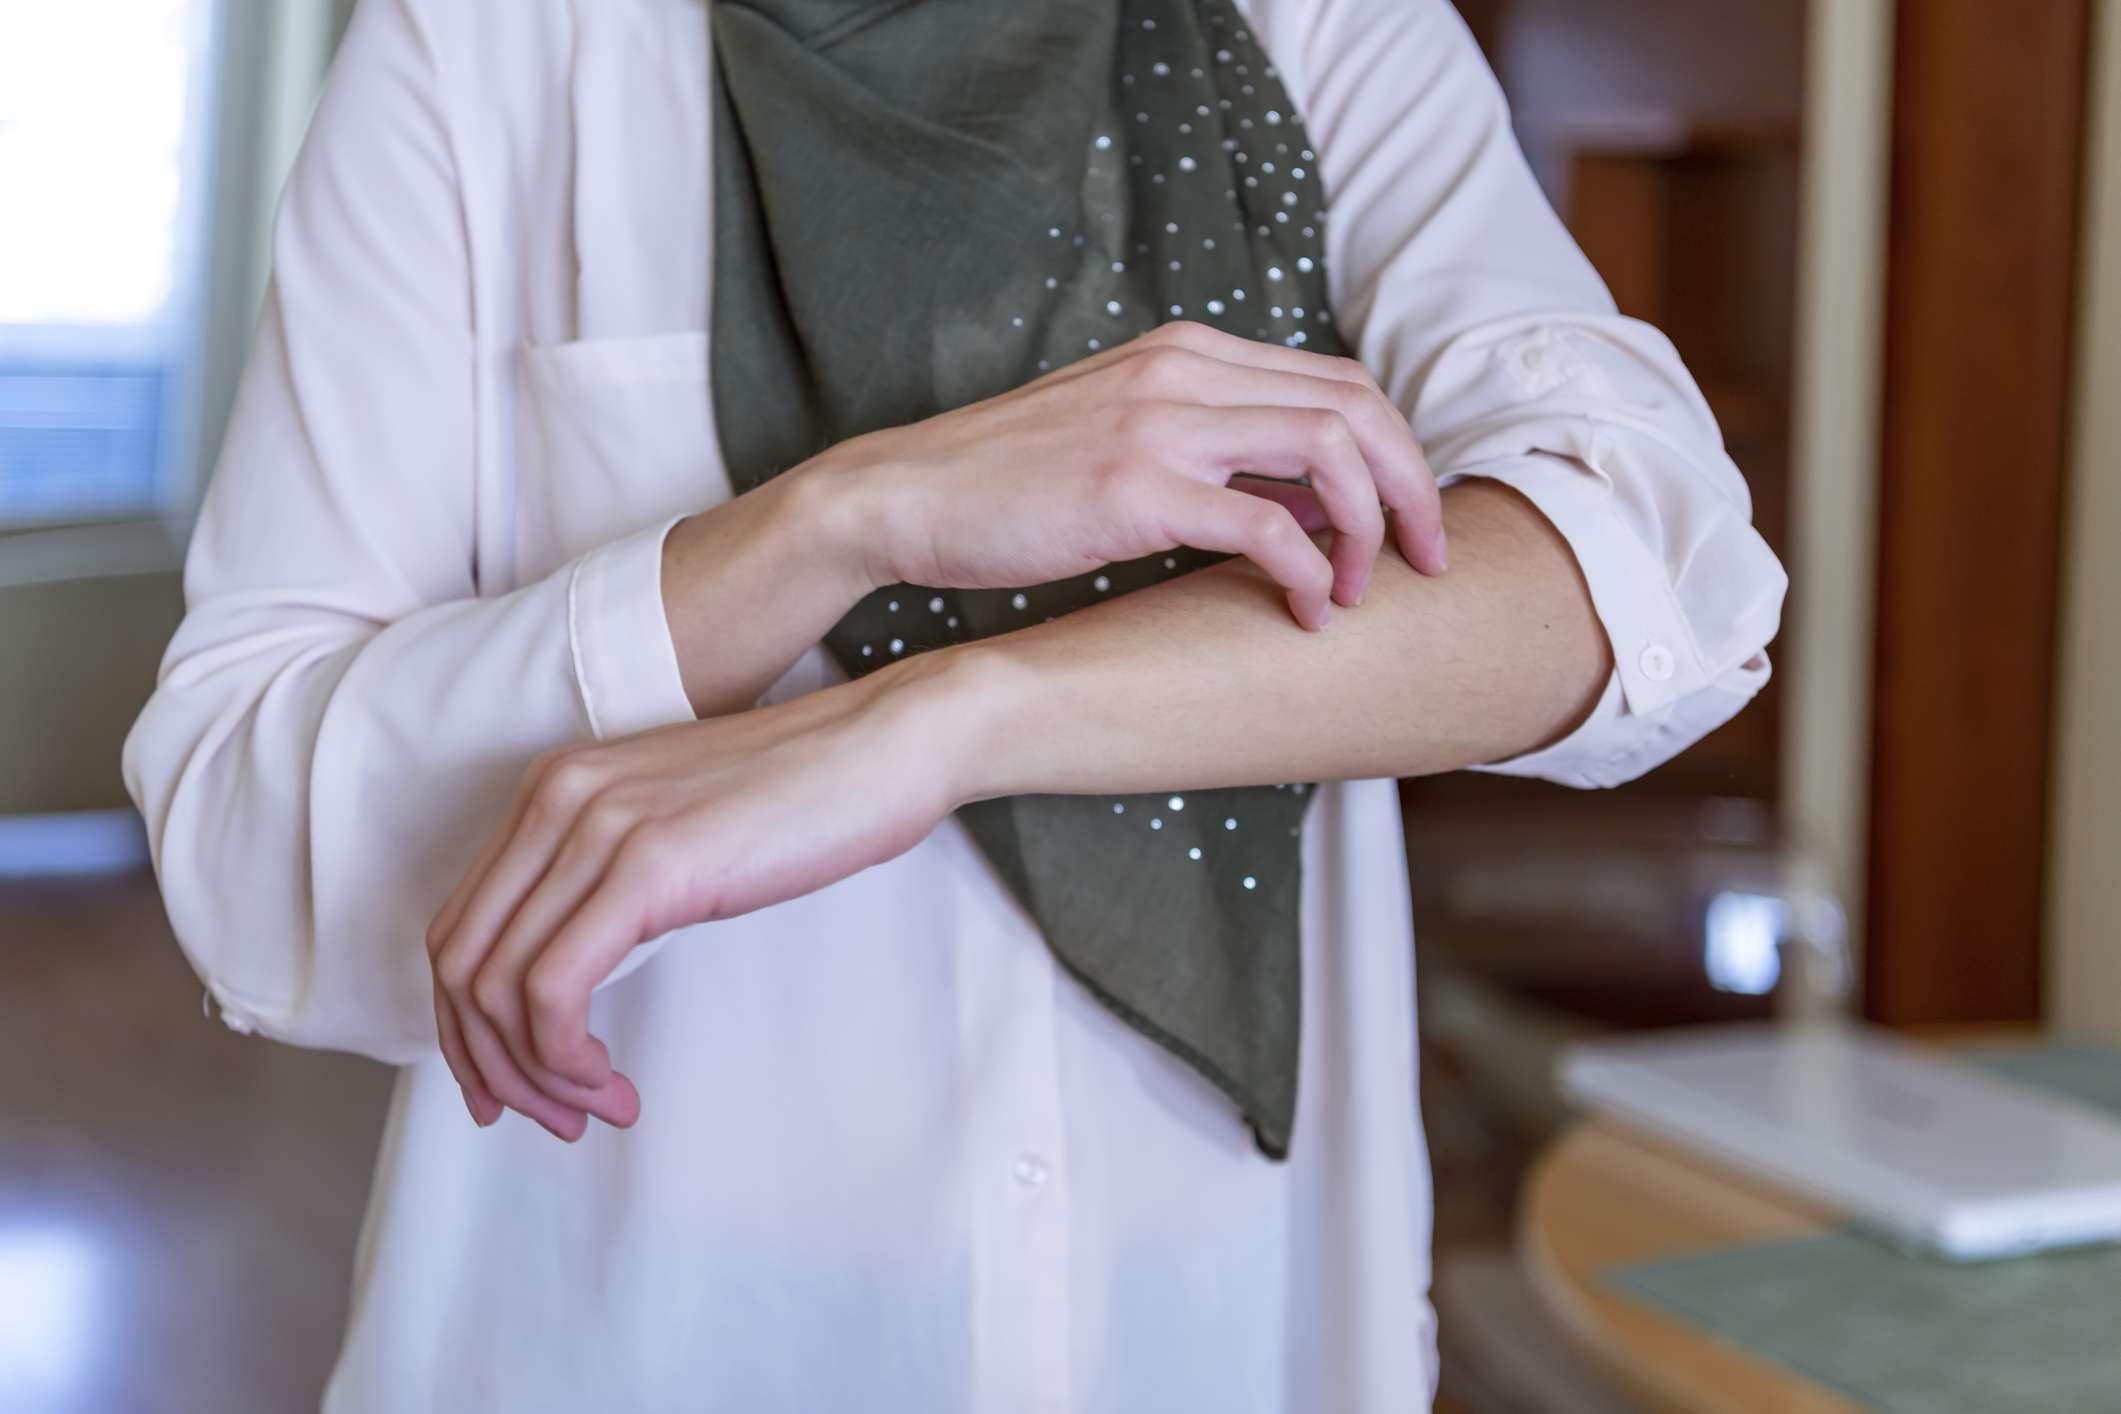 Woman itching a rash